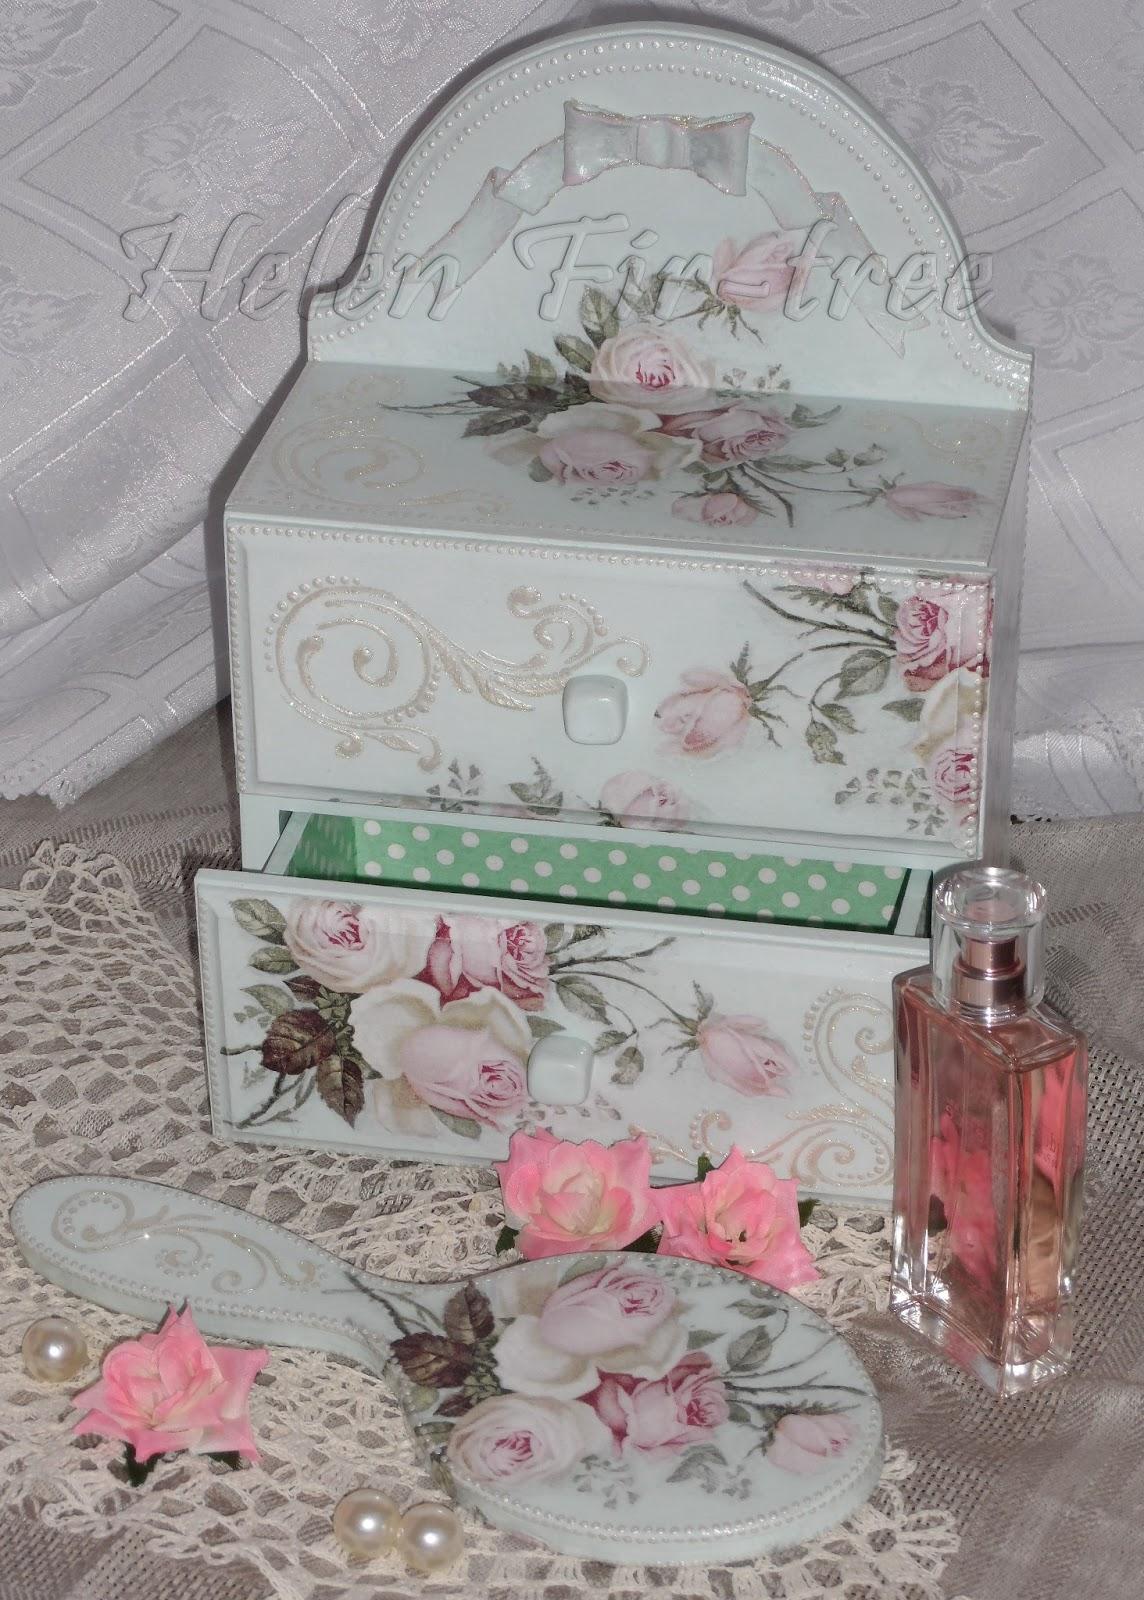 Helen Fir-tree декупаж зеркало букет роз decoupage mirror bouquet of roses